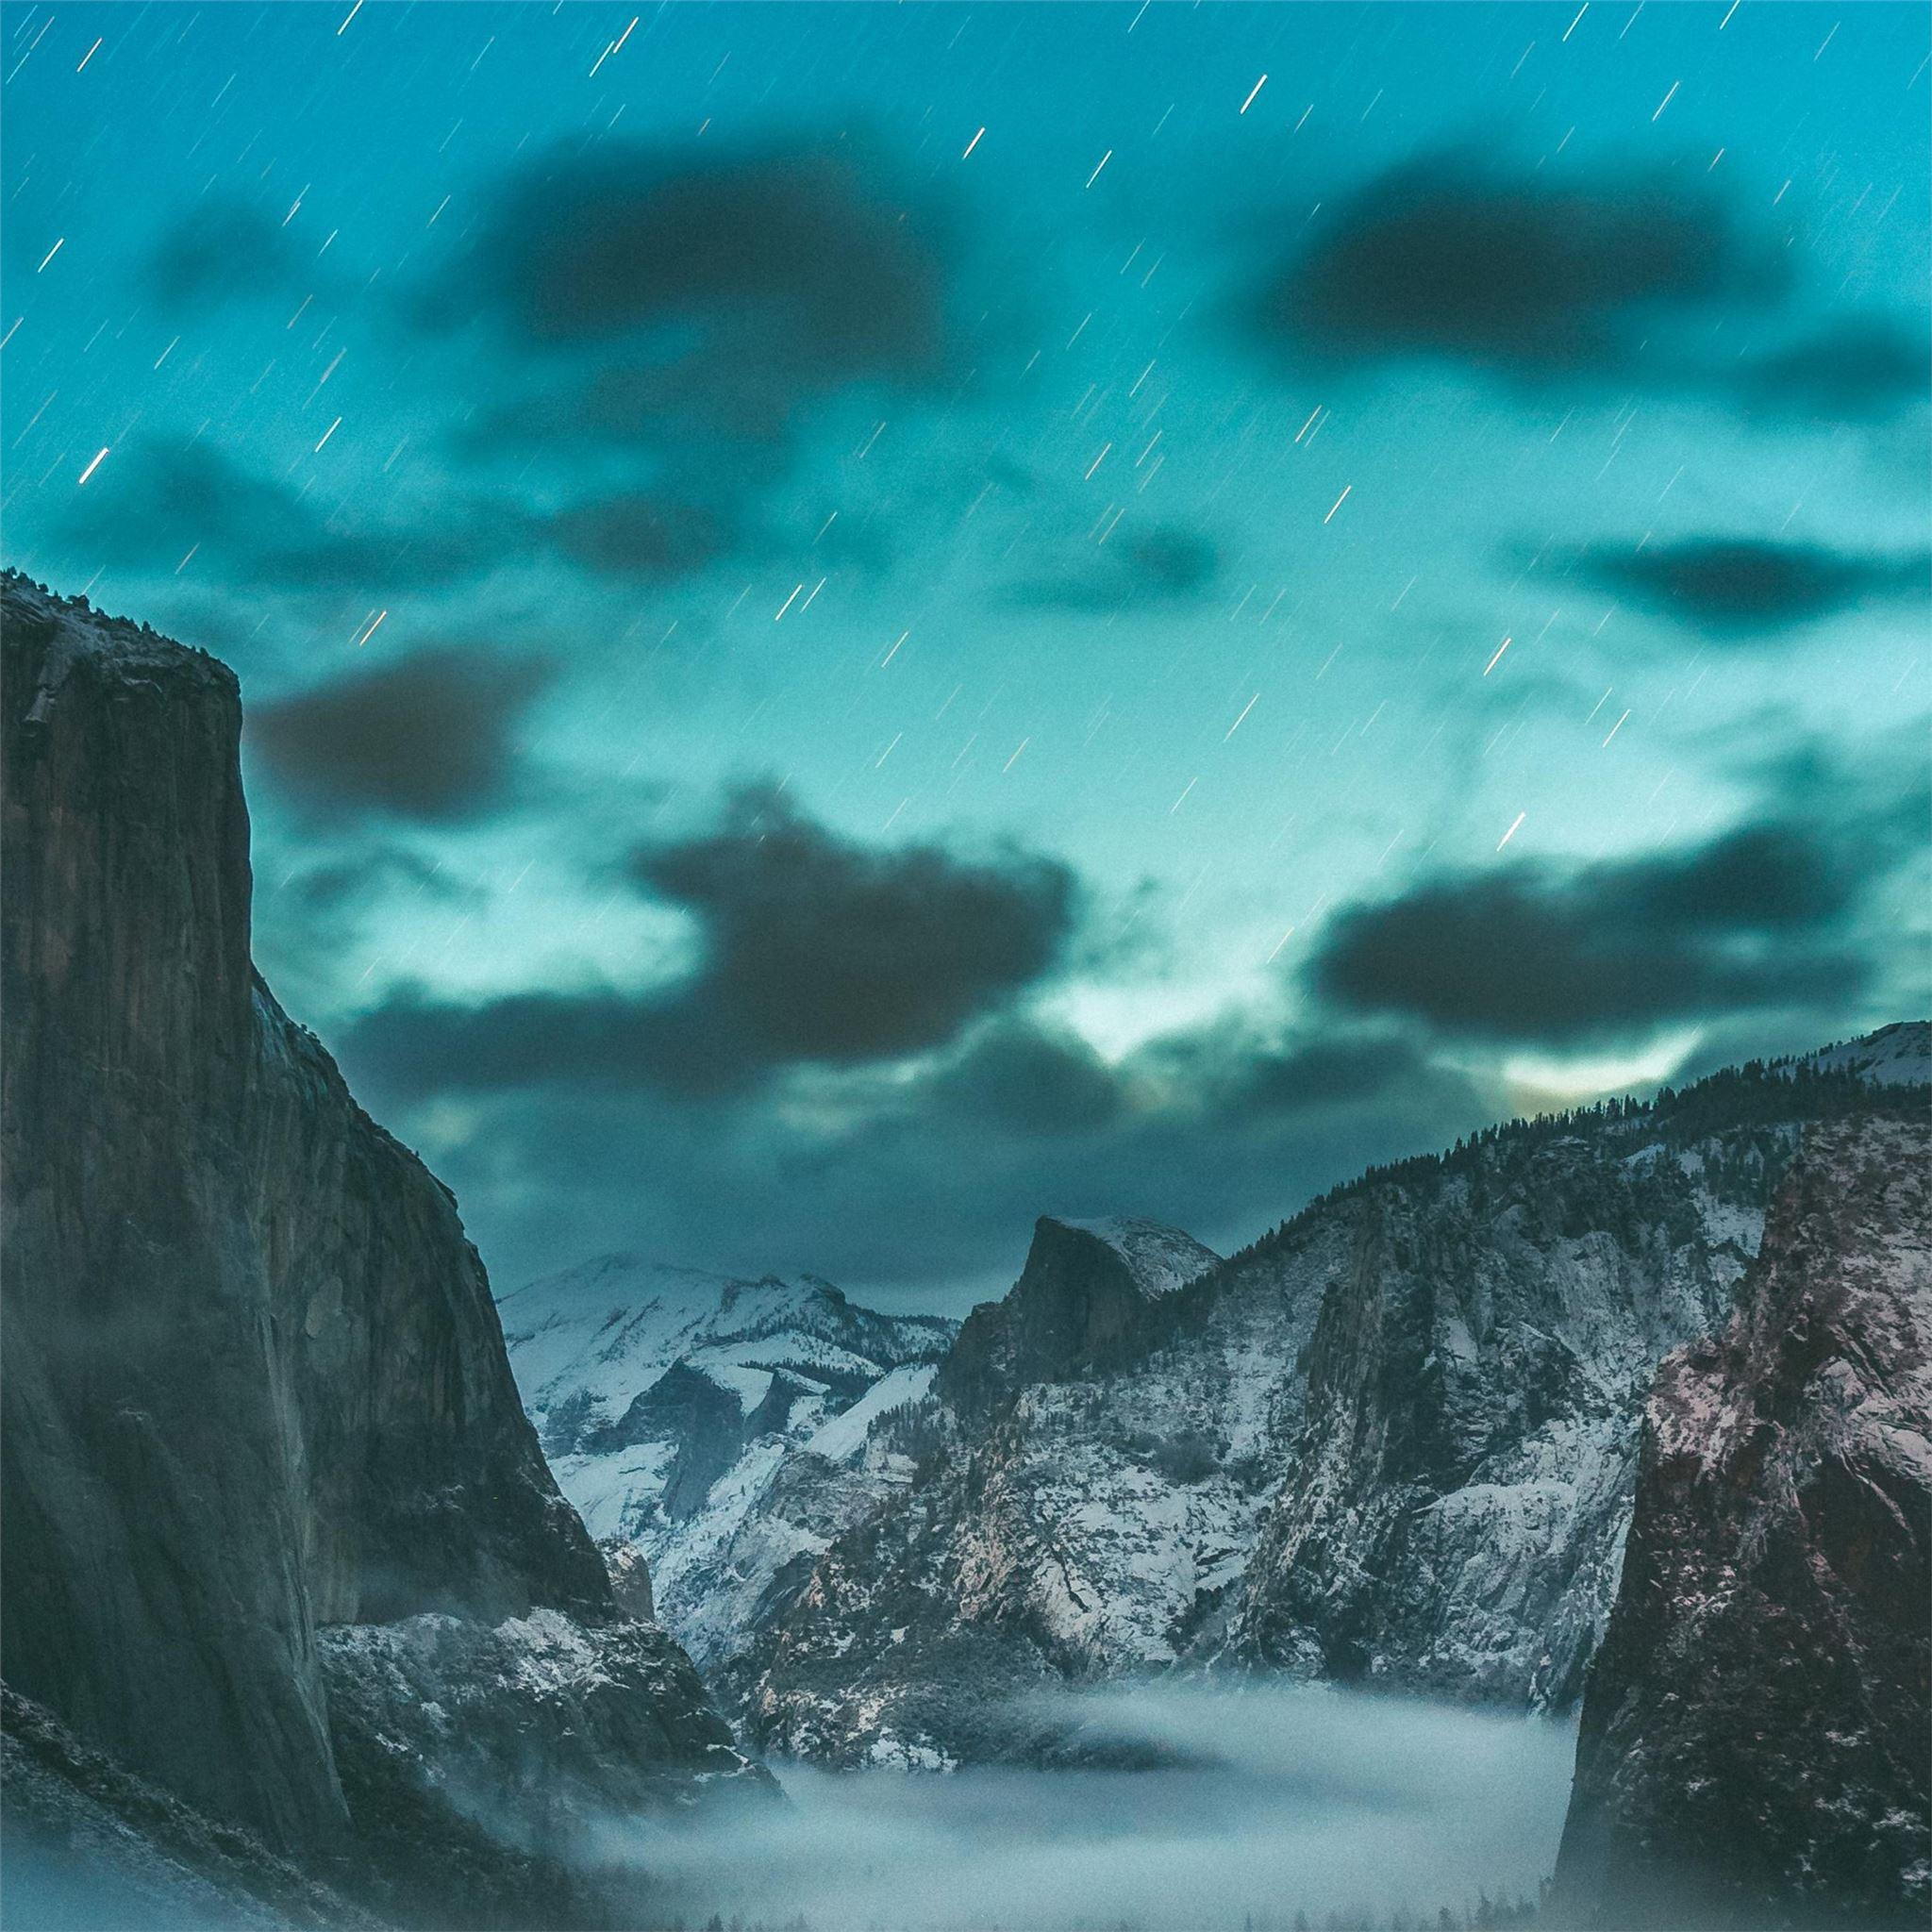 Yosemite Valley Landscape 4k Ipad Air Wallpapers Free Download